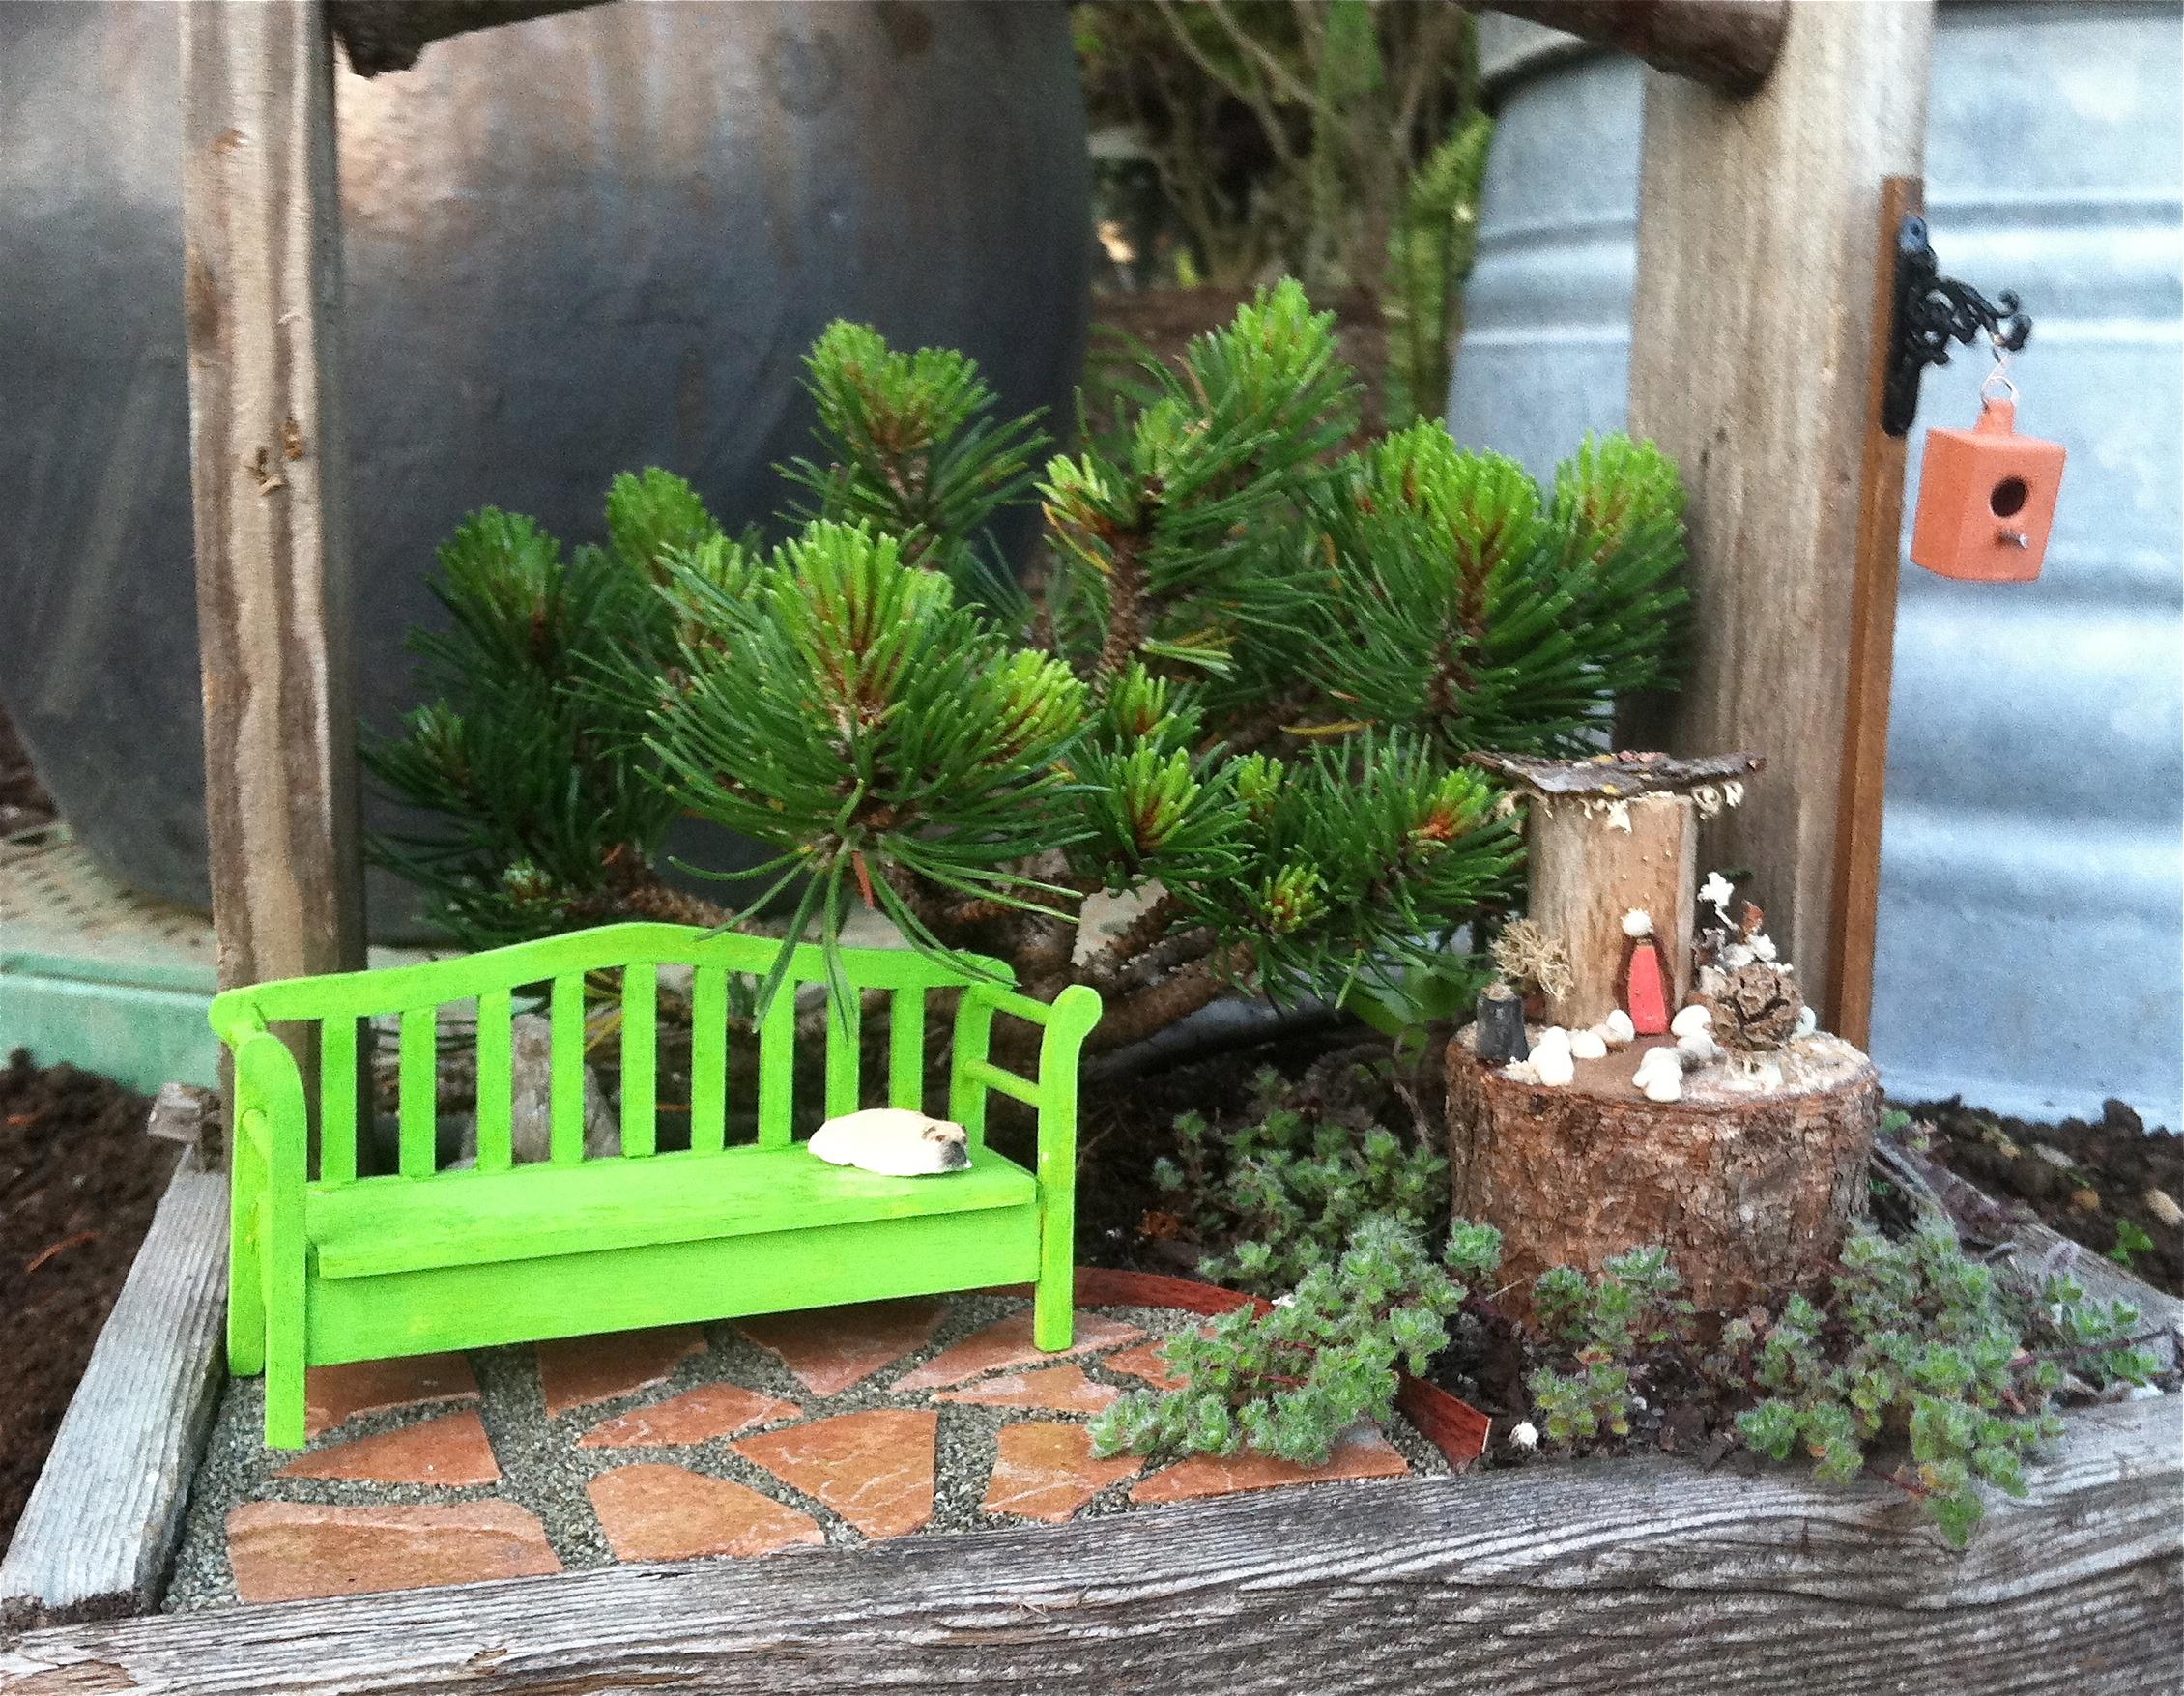 Miniature Fairy House for the Miniature Garden